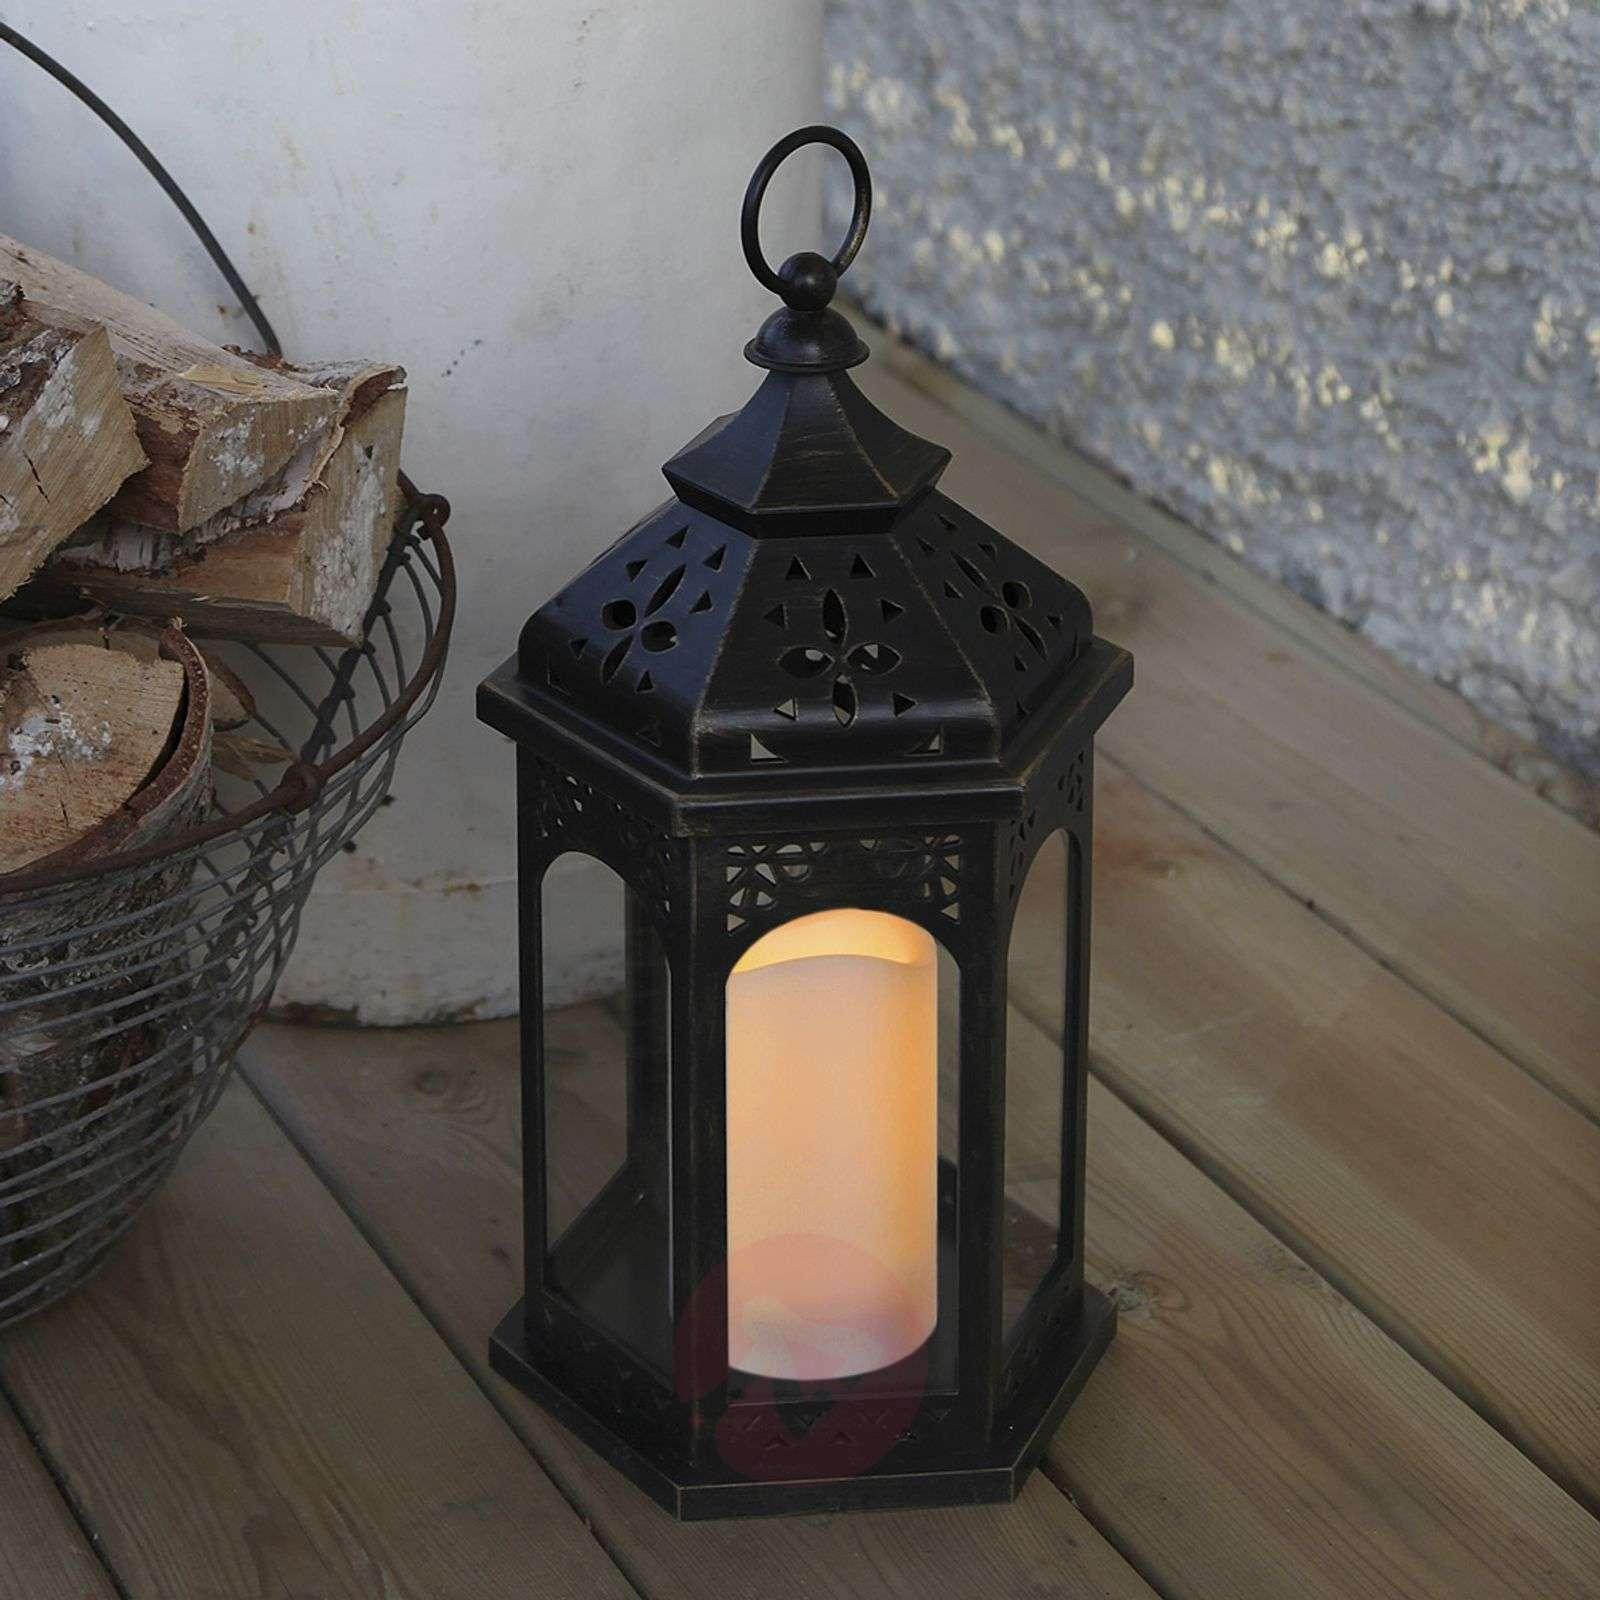 Amber LED lantern, 33 cm, black-1522662-01